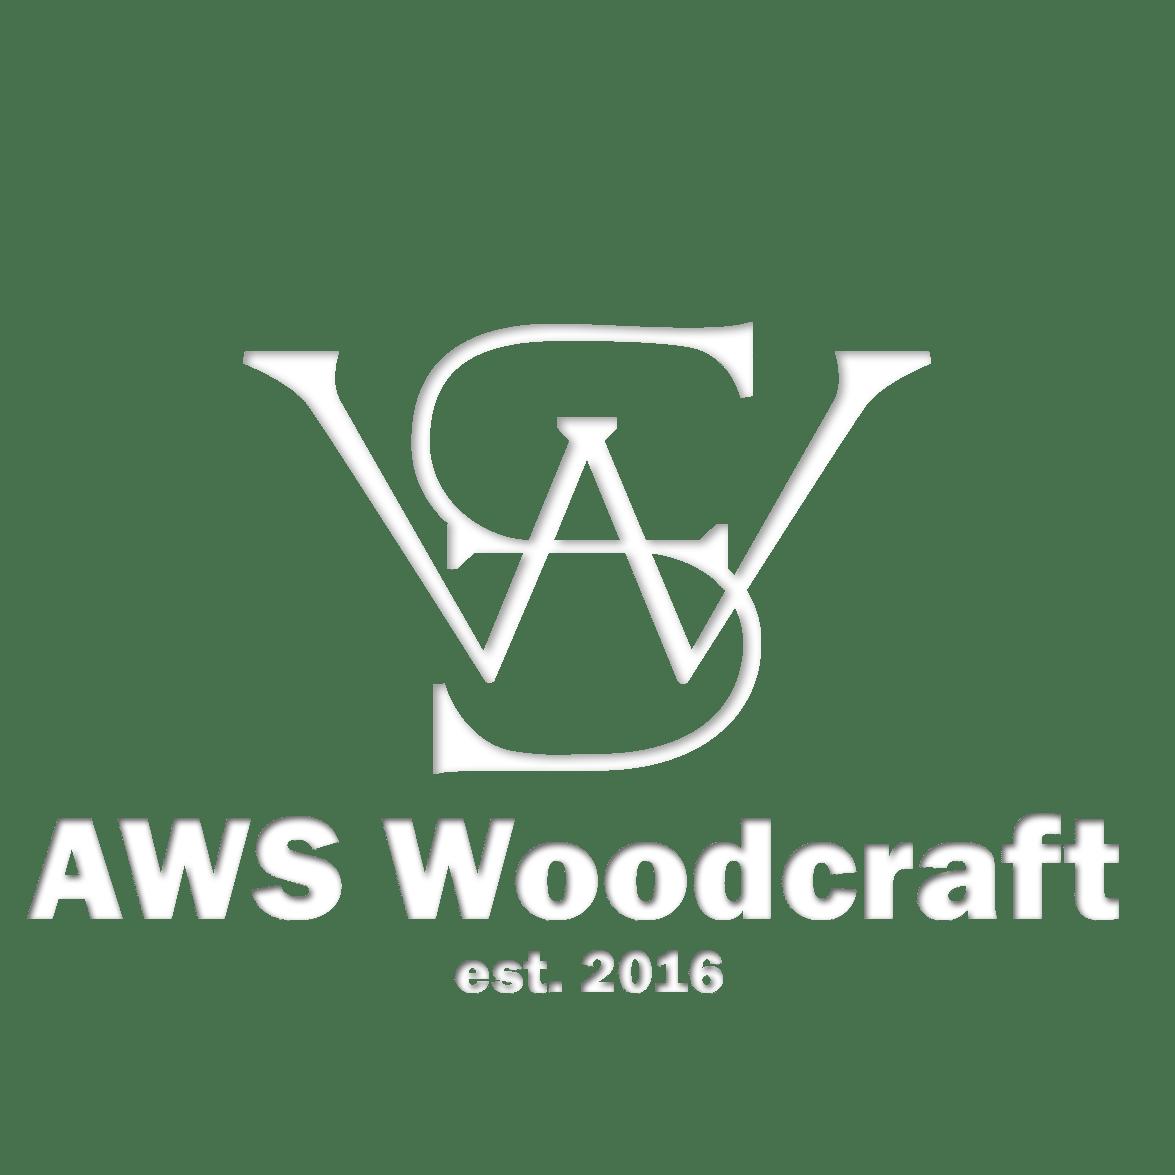 AWS Woodcraft